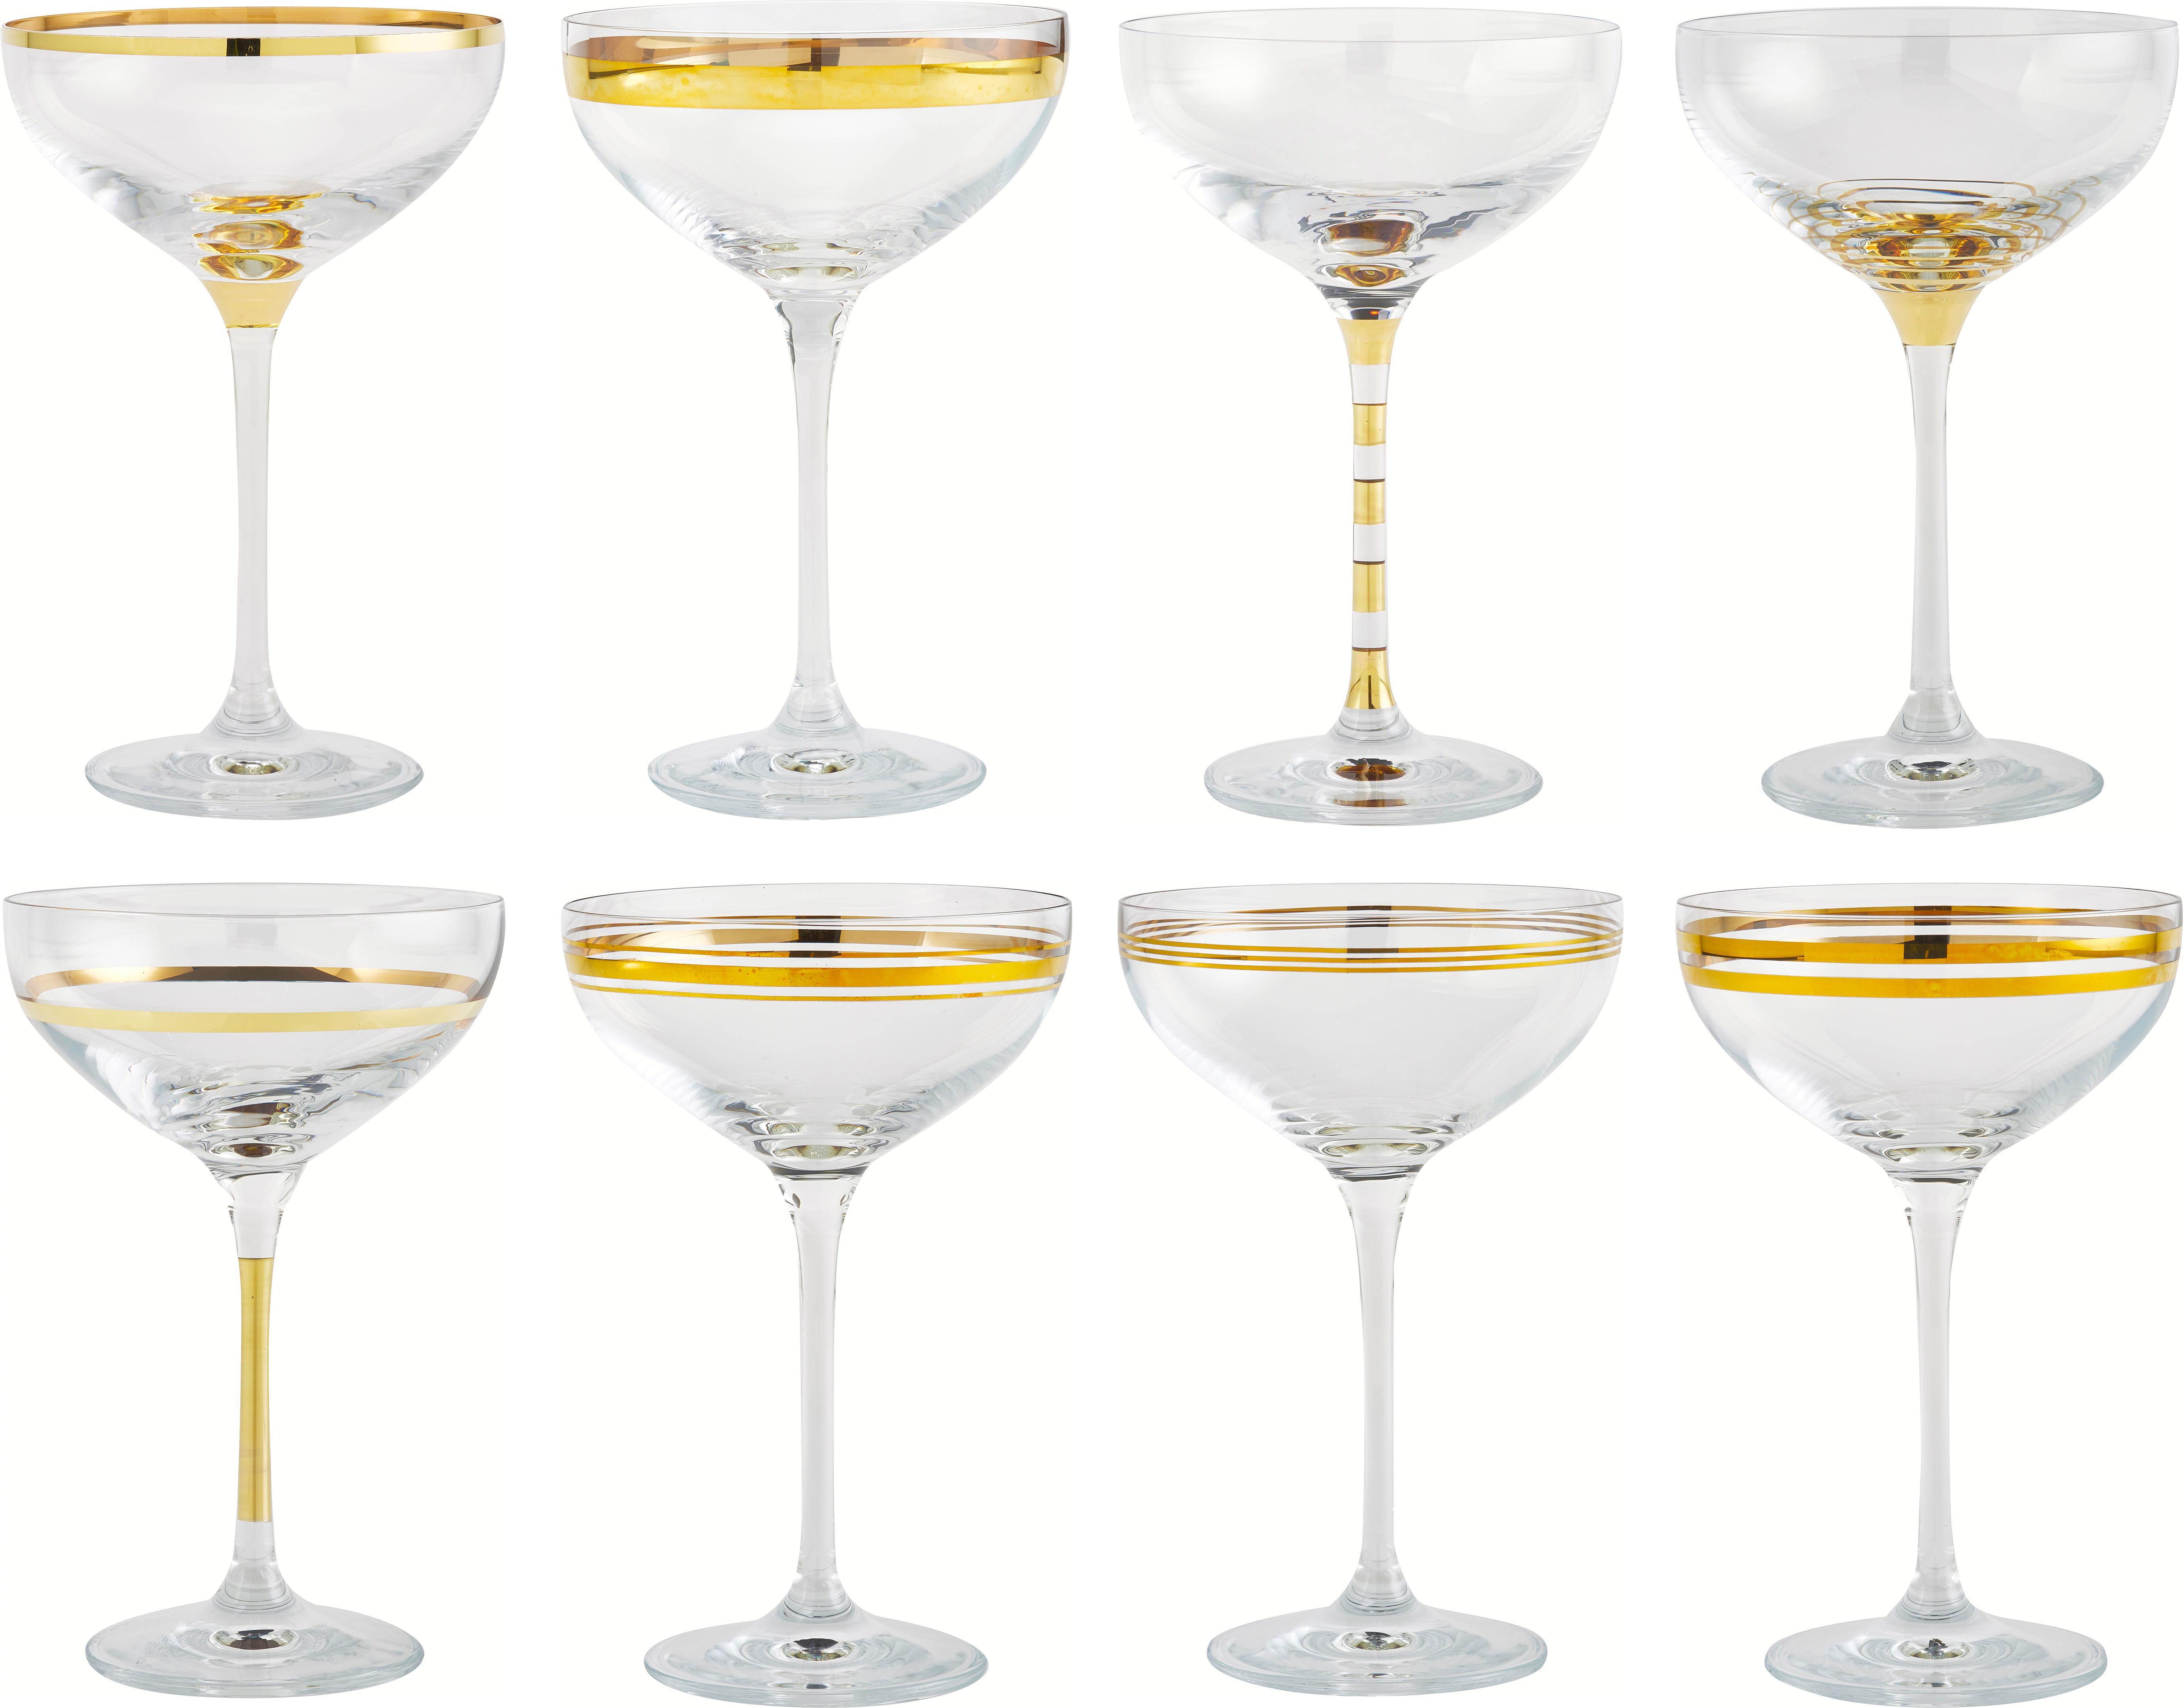 Champagnerschalen Deco mit Goldverzierungen, 8er-Set, Glas, Transparent, Goldfarben, Ø 11 x H 17 cm